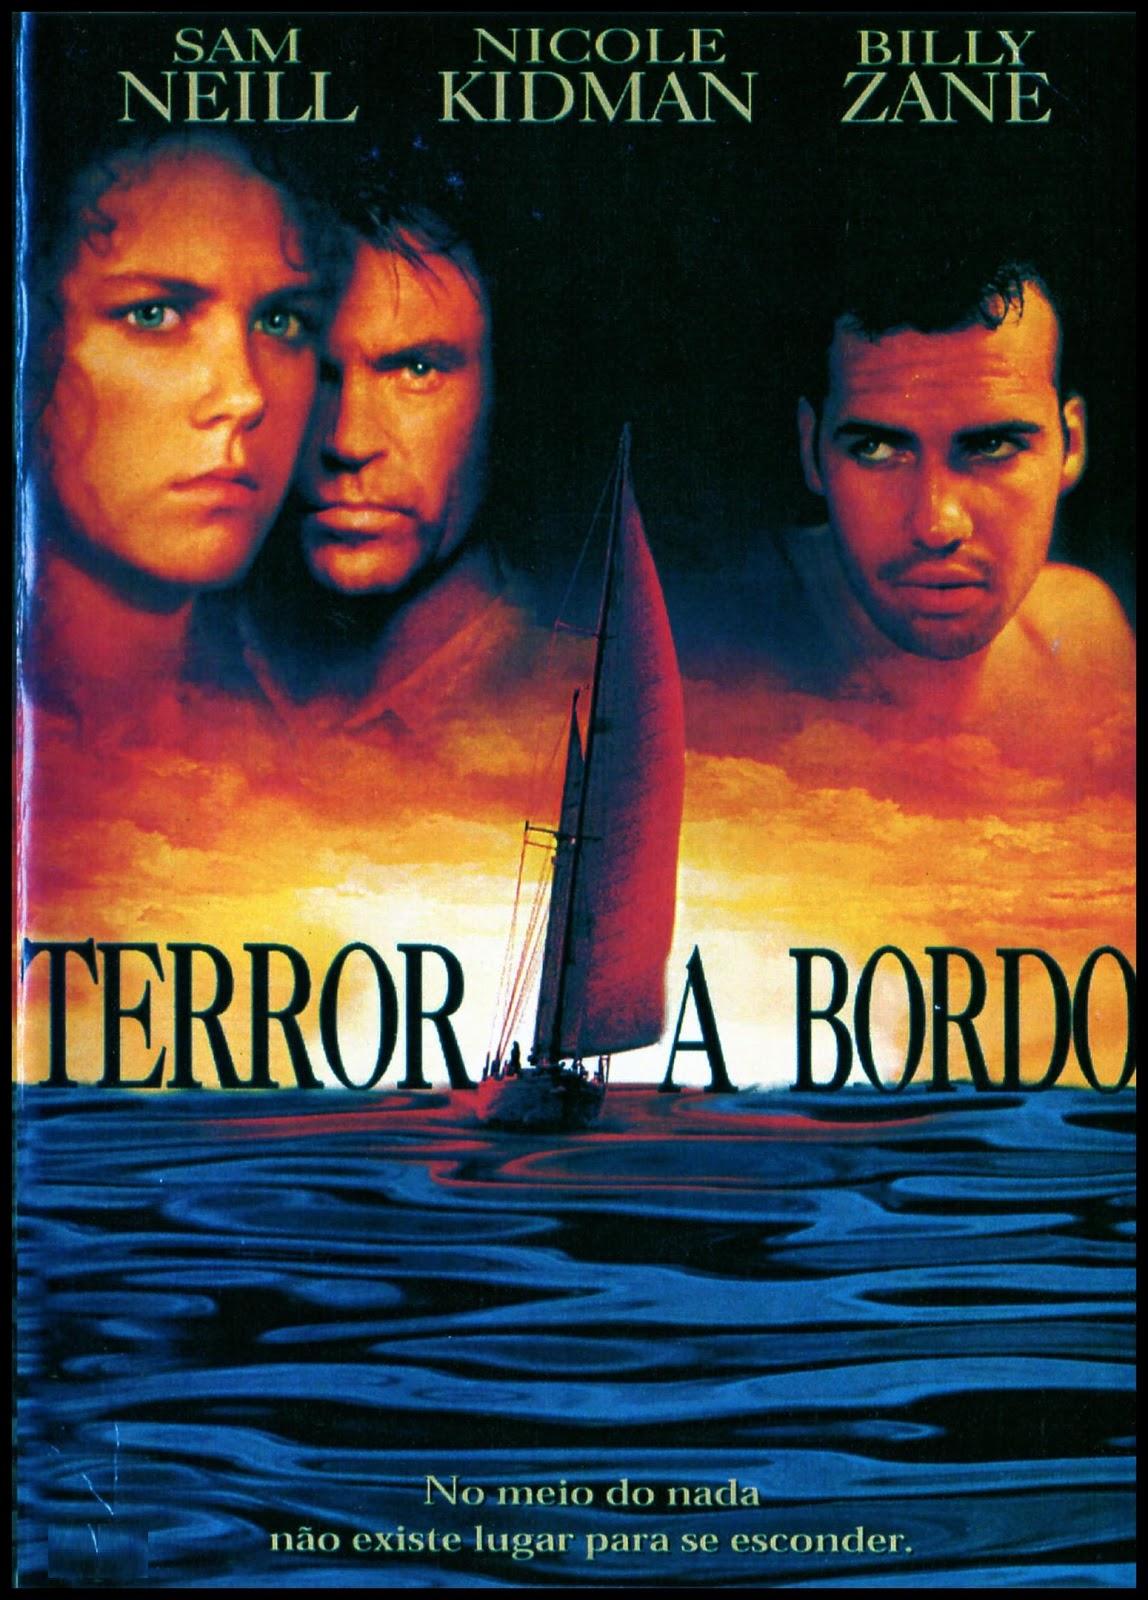 http://3.bp.blogspot.com/-DSCg_rYmJpk/UMqHCa2bzsI/AAAAAAAAO6c/wTYMODzbJe0/s1600/filme+terror+a+bordo.jpg